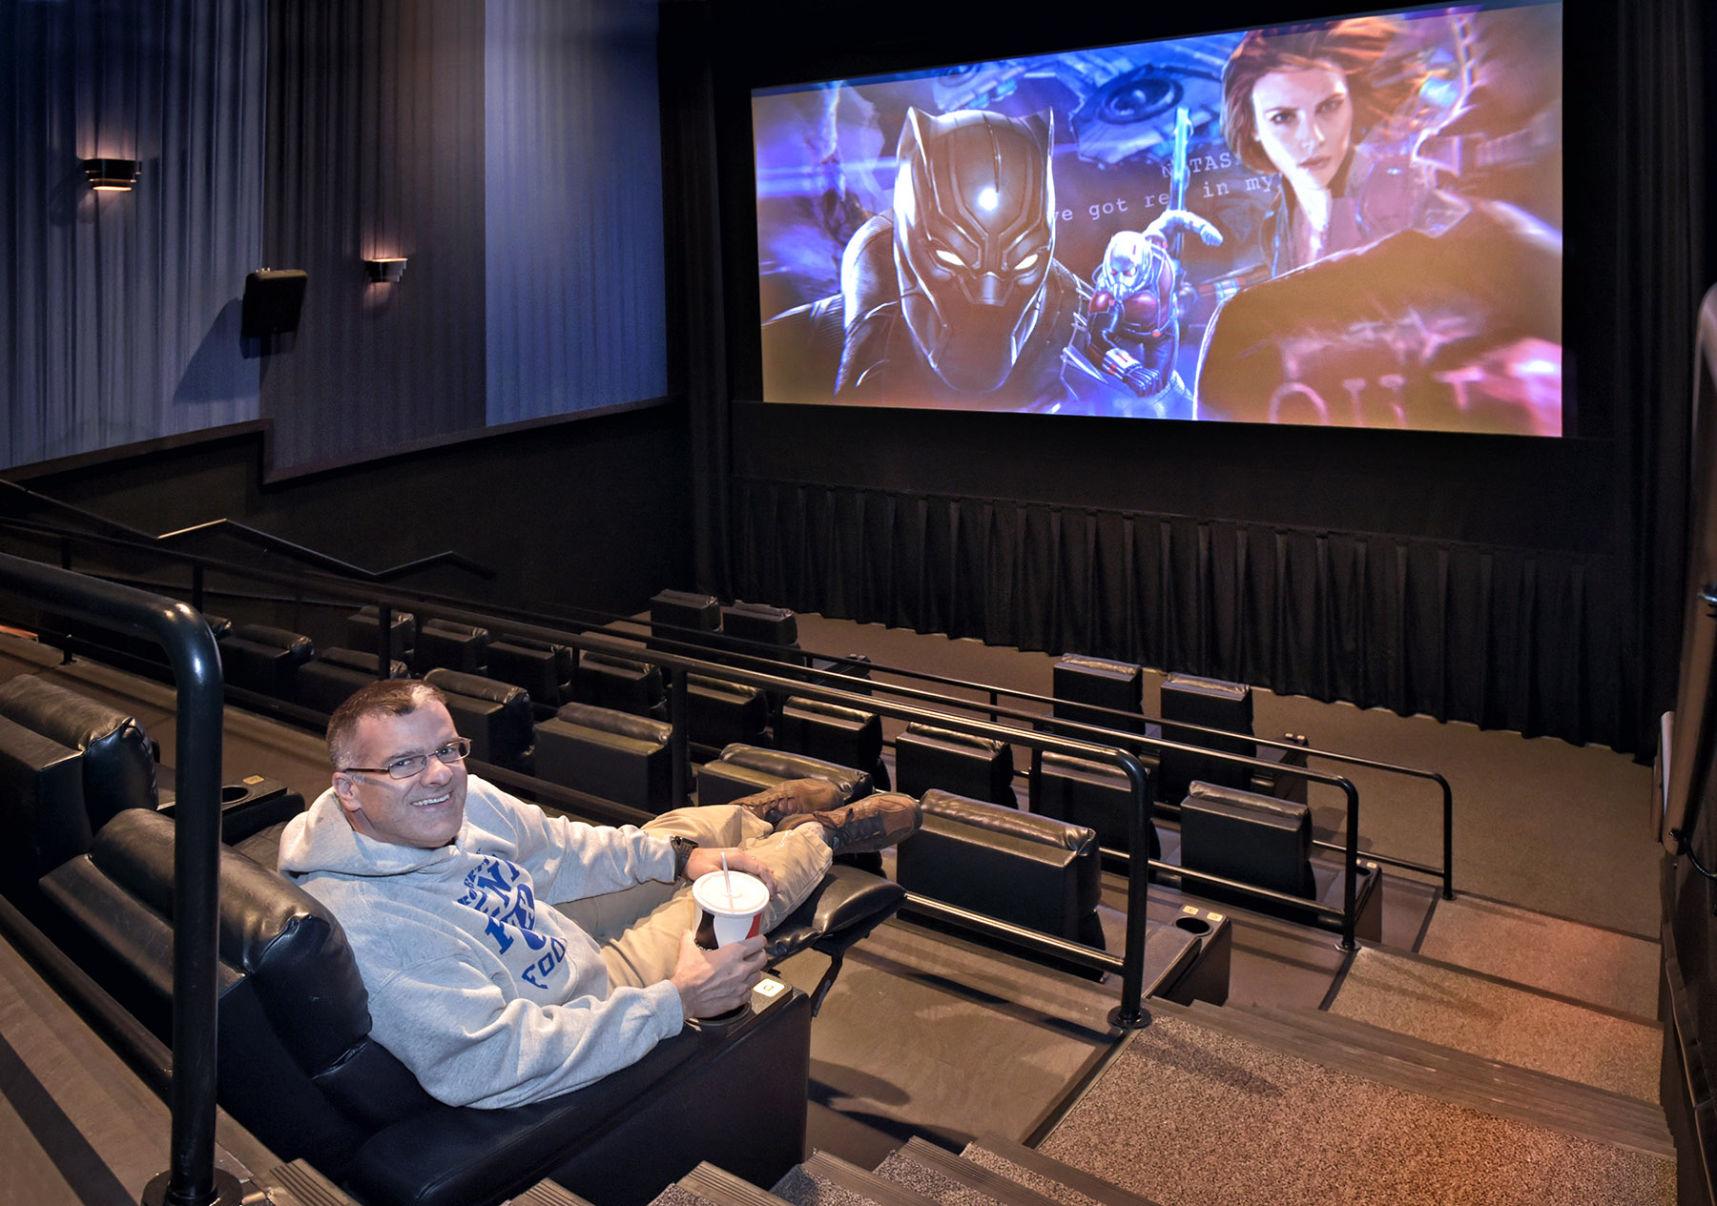 Penn Cinema